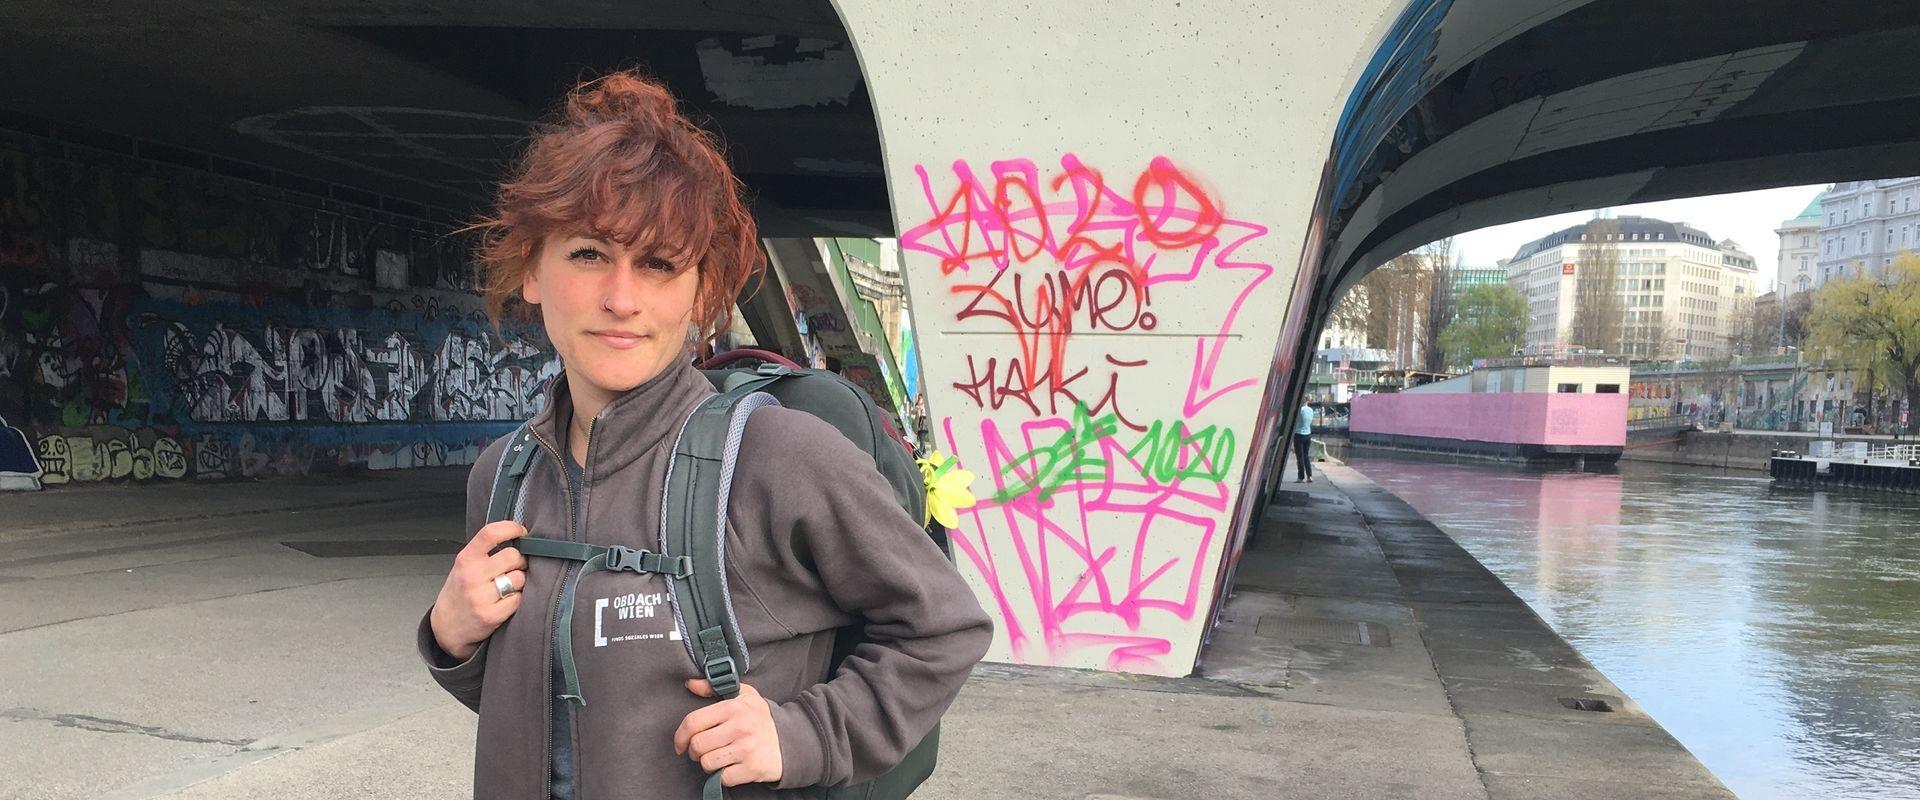 Straßensozialarbeiterin Carmen gibt Einblicke in den Arbeitsalltag während Corona.